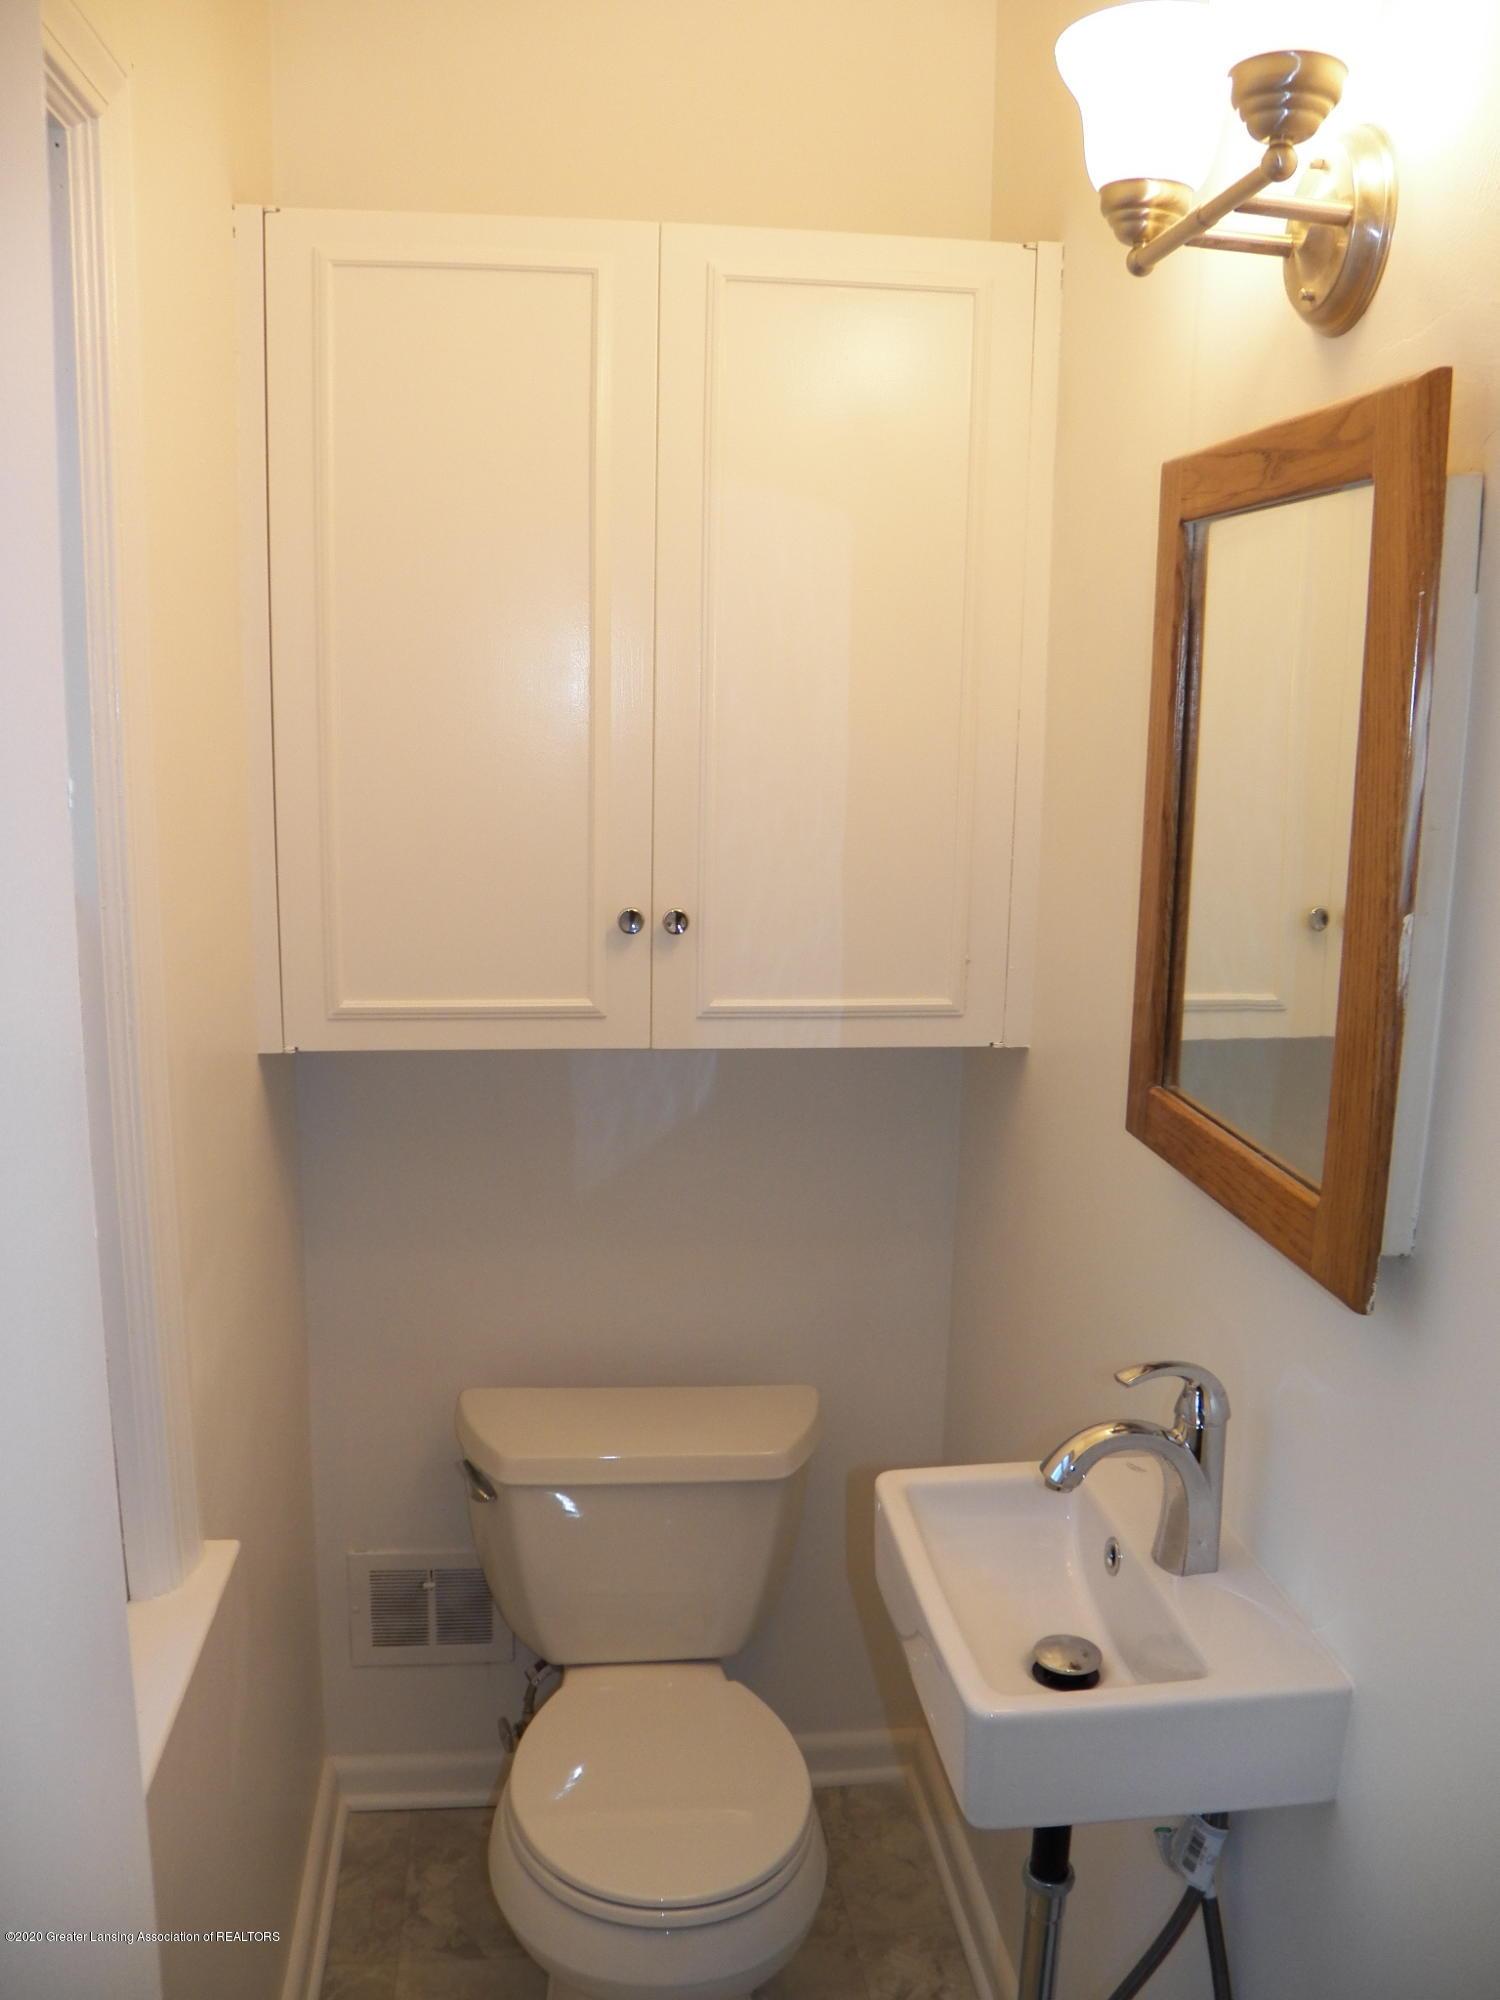 1812 Shubel Ave - 1/2 bath - 11